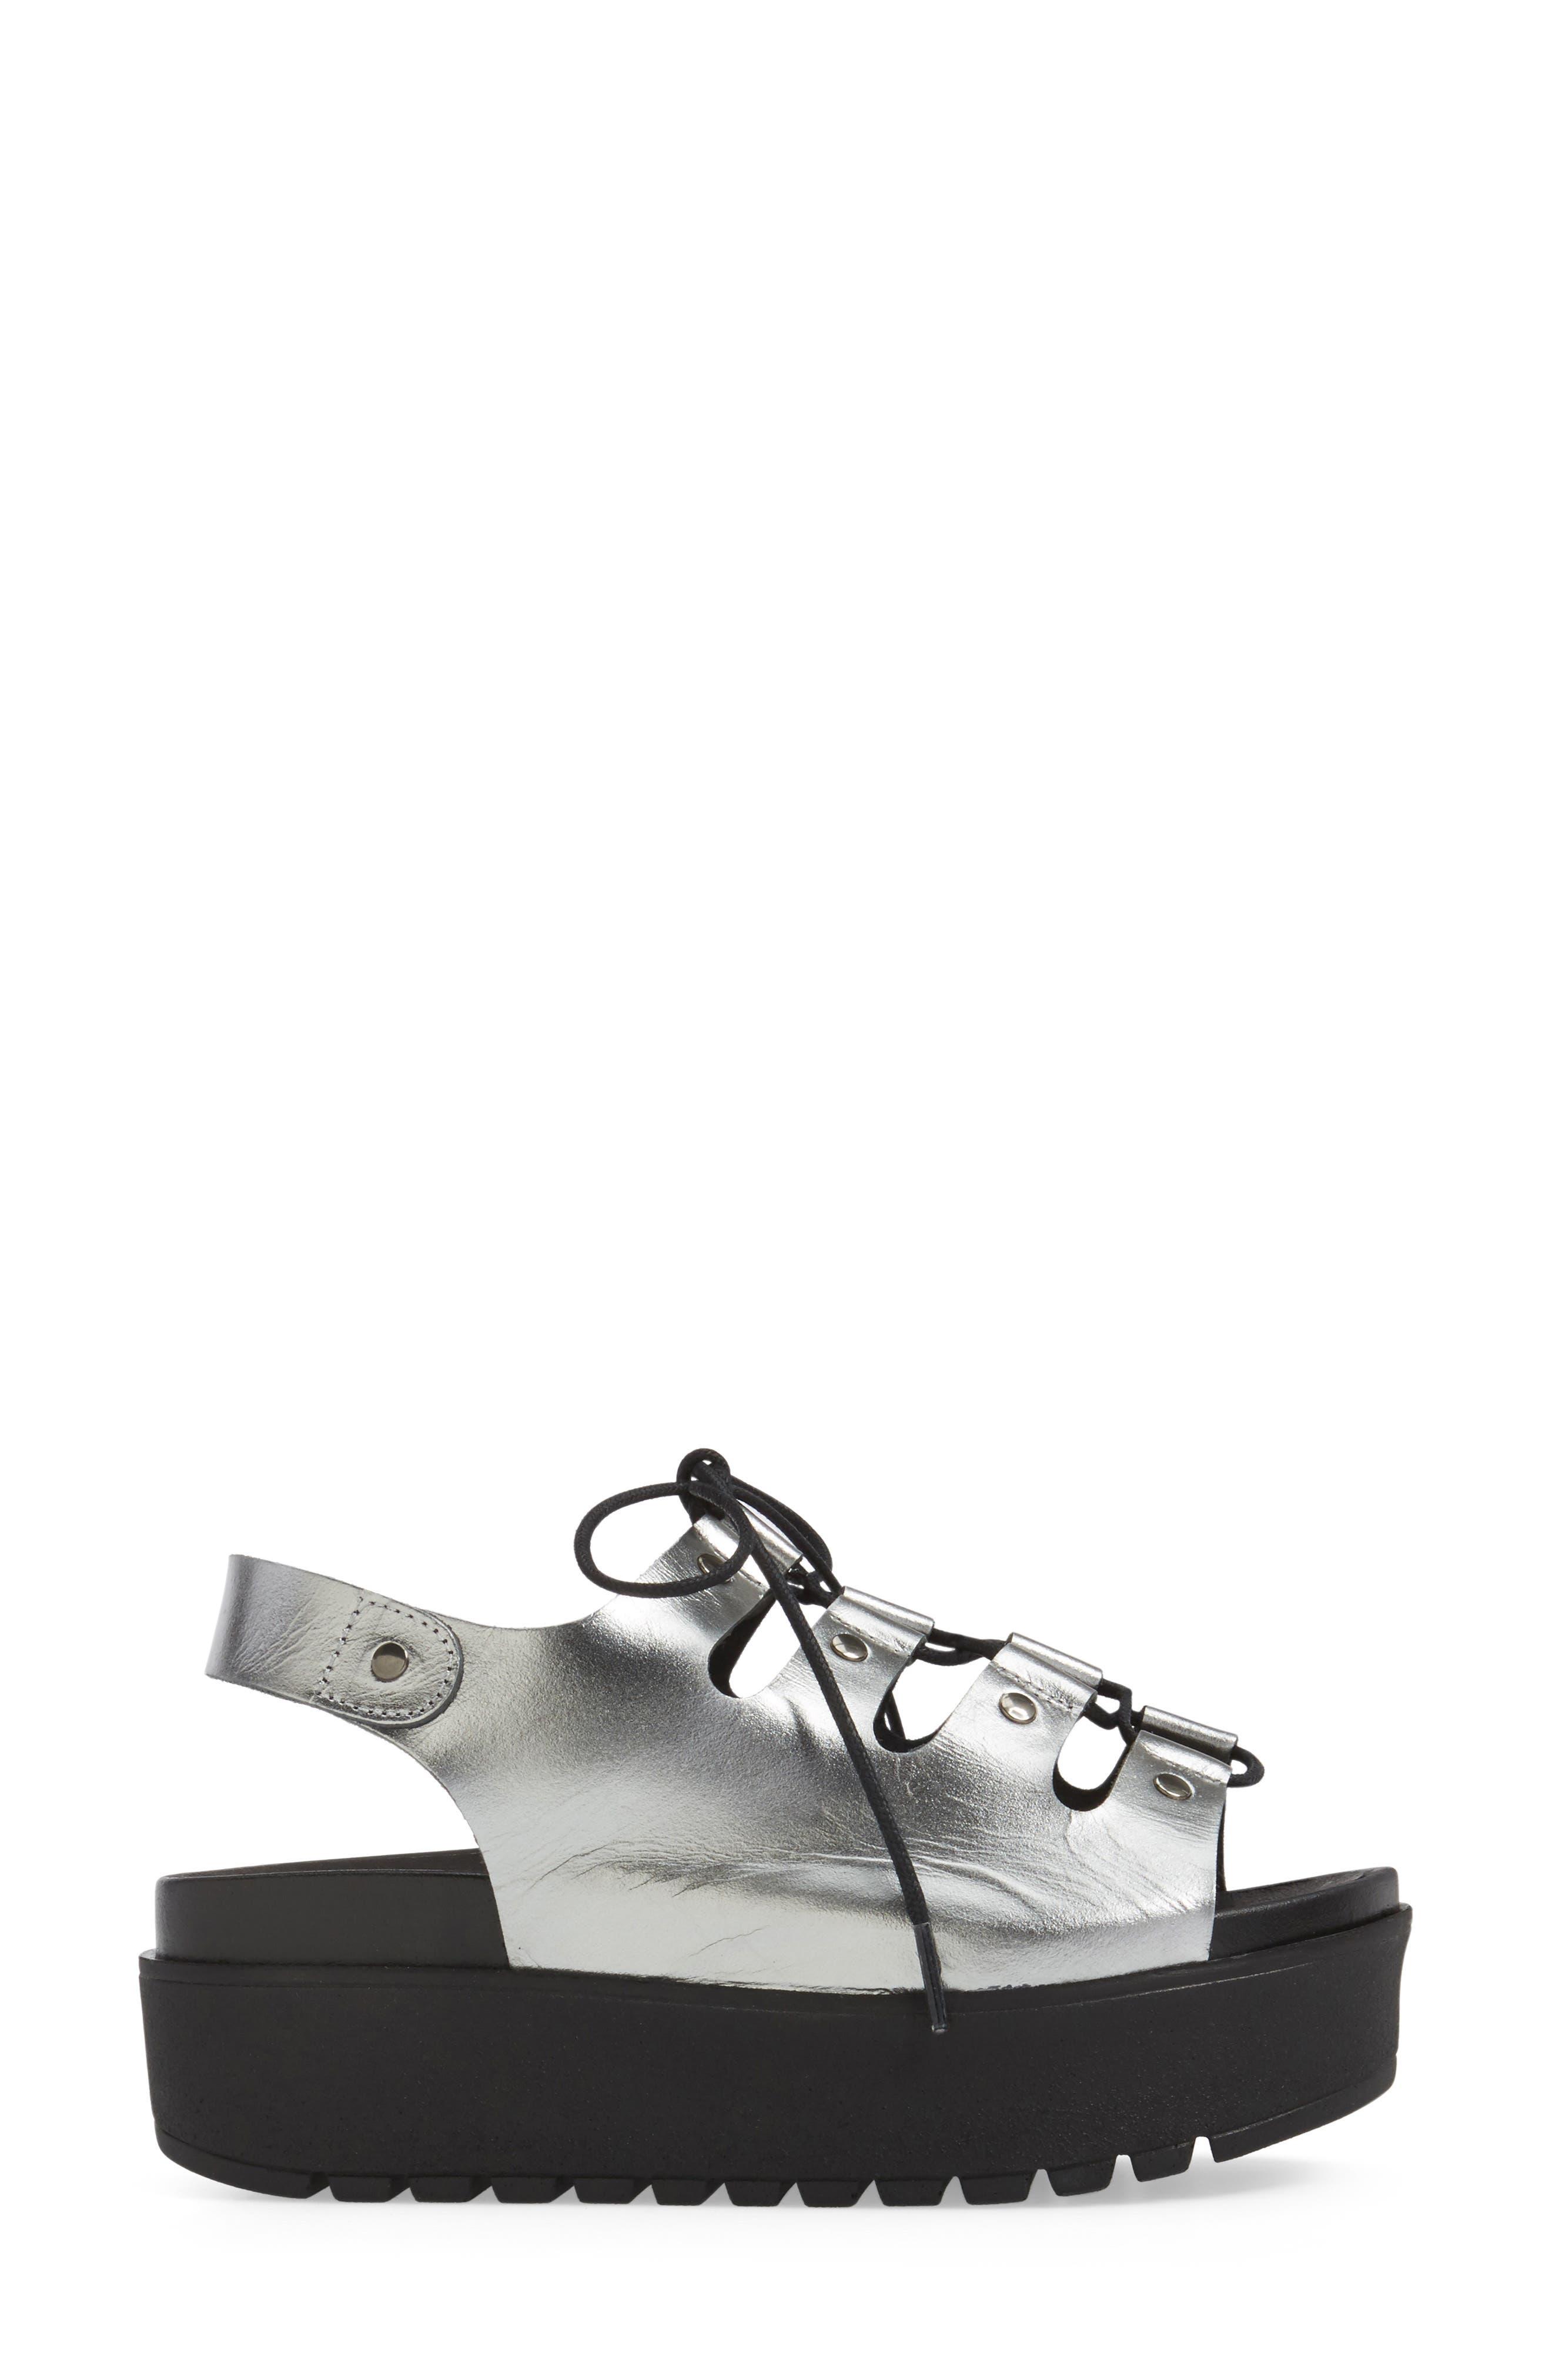 Kacey Platform Sandal,                             Alternate thumbnail 3, color,                             Pewter